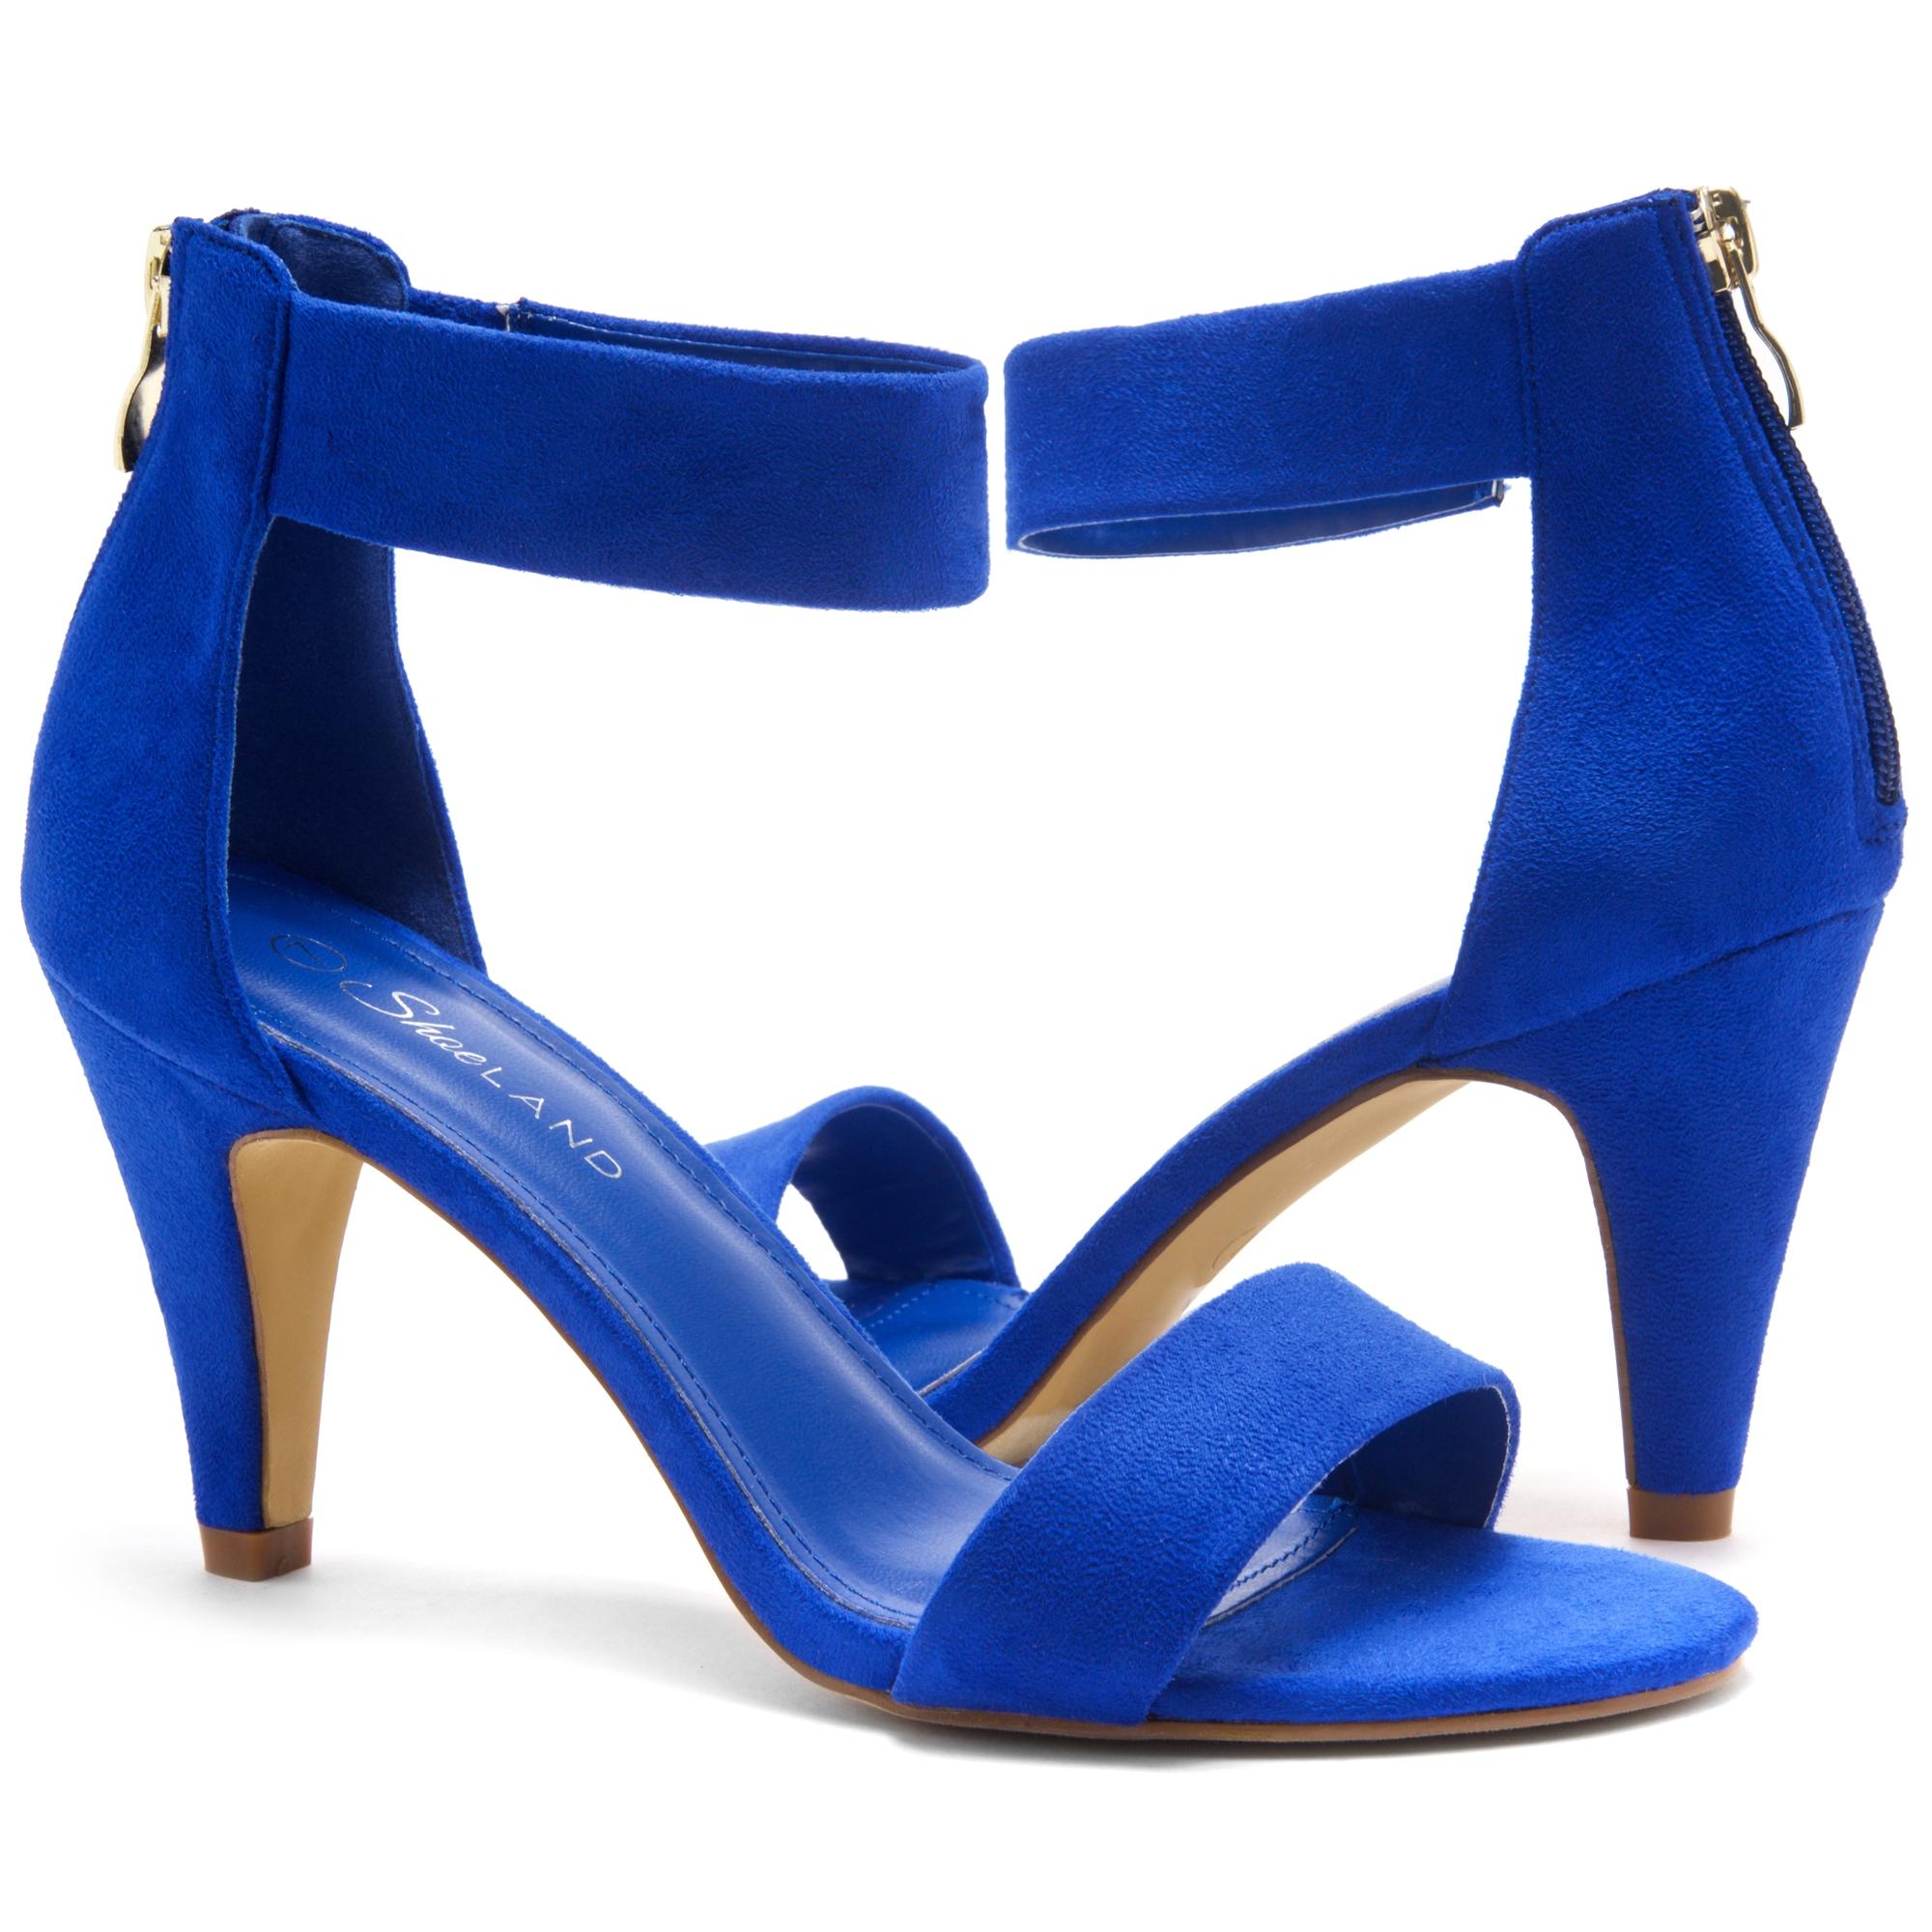 HerStyle Rose-Stiletto heel, back